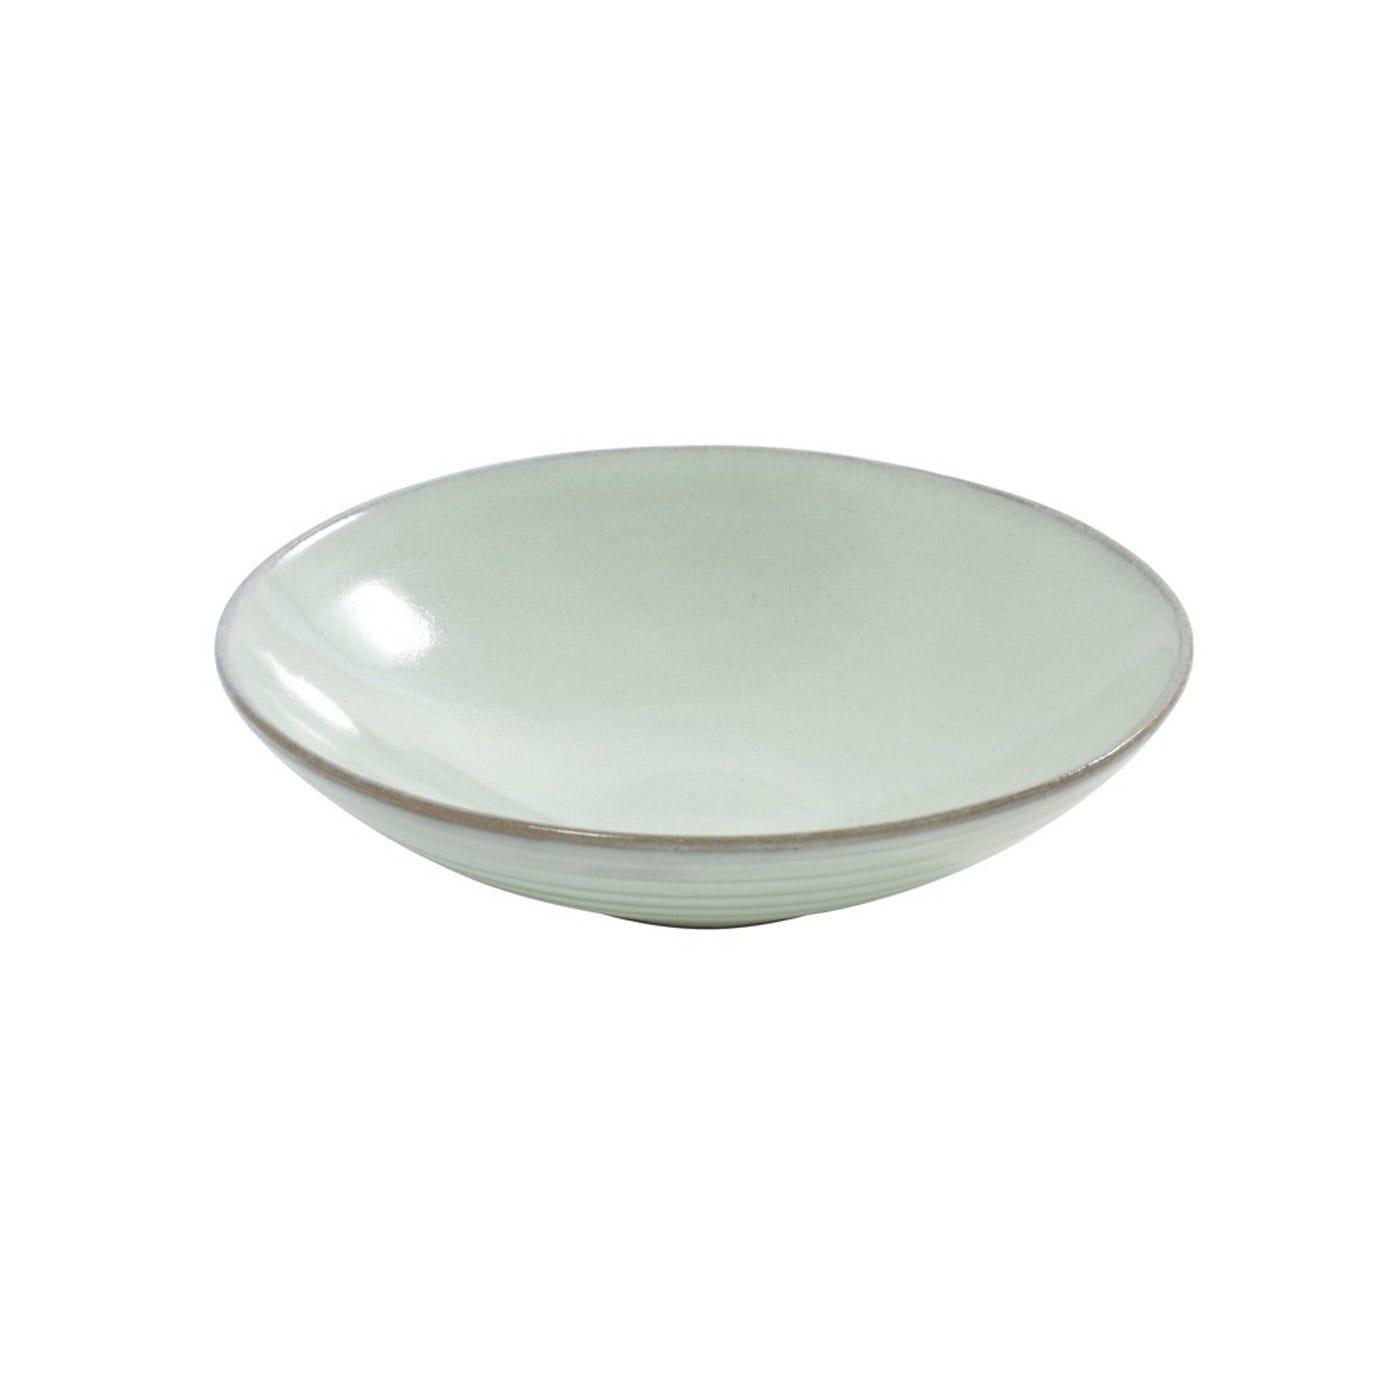 Serax Celadon Soup Plate Aqua